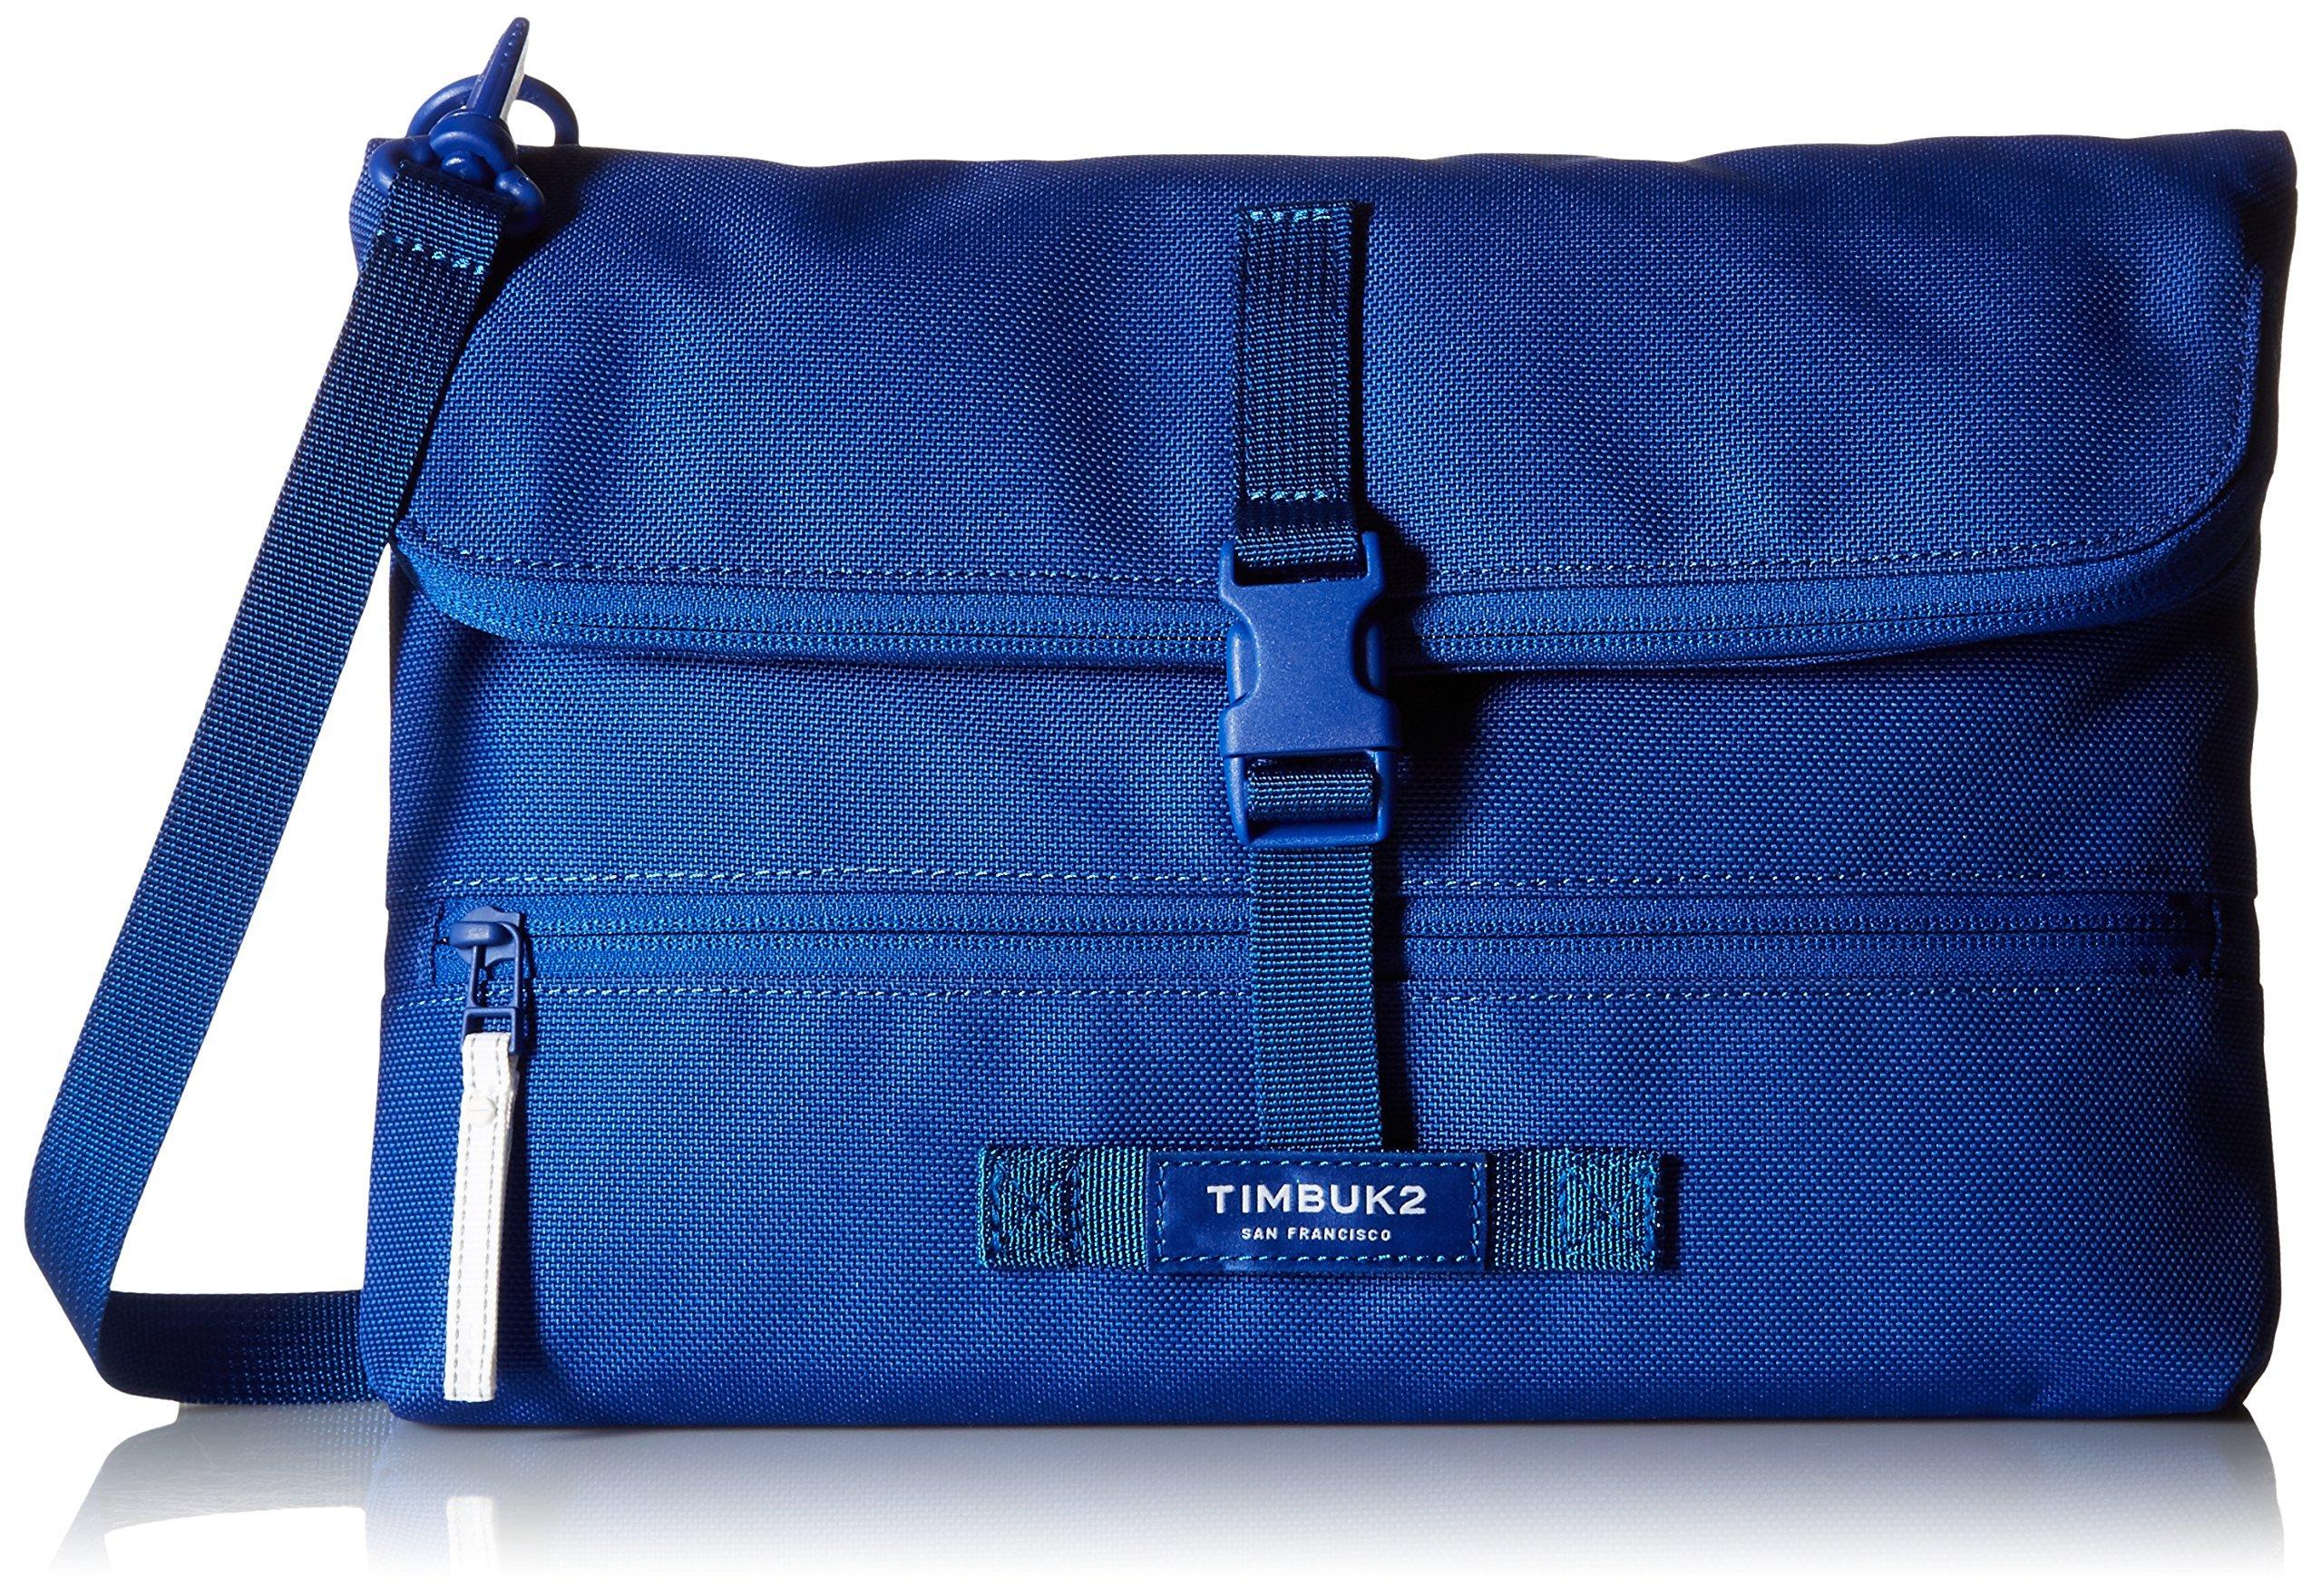 Timbuk2 Women's Page Crossbody Bag, Intensity by Timbuk2